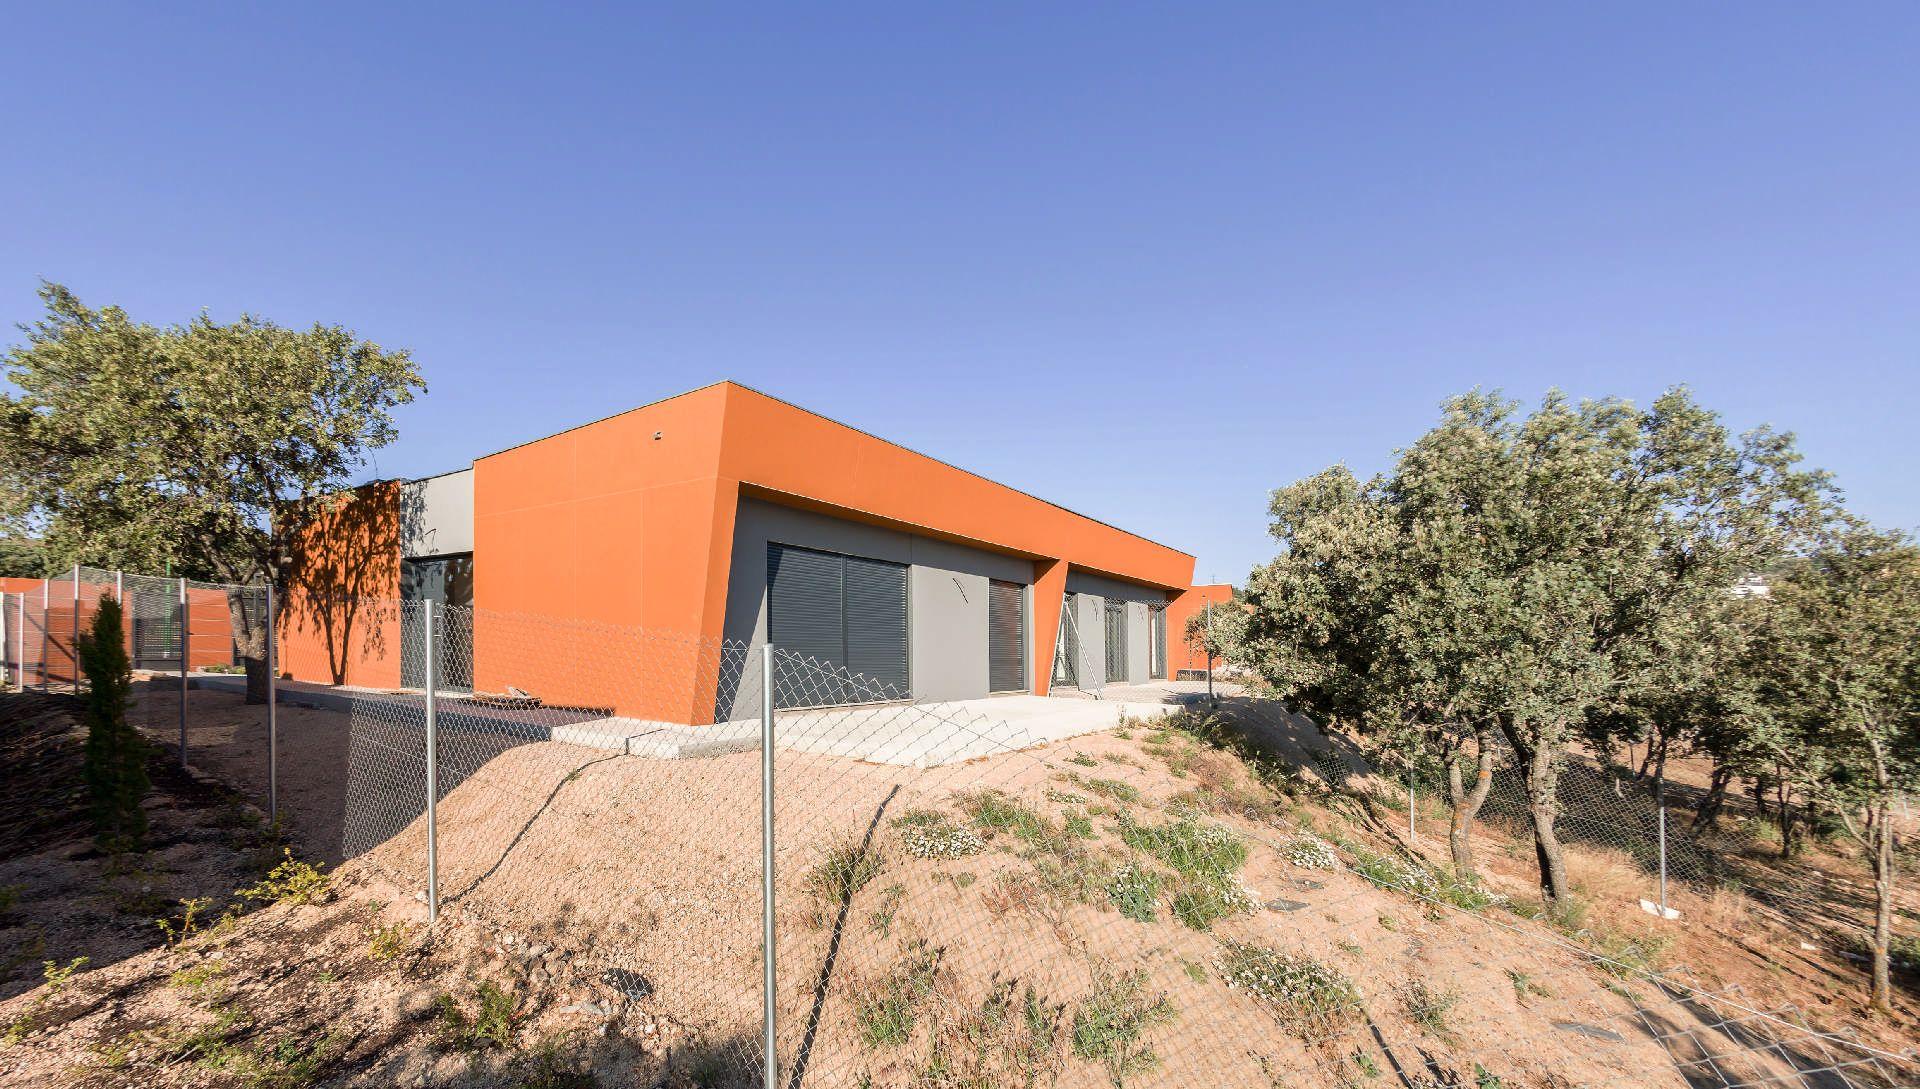 Casa Violeta - img 14.